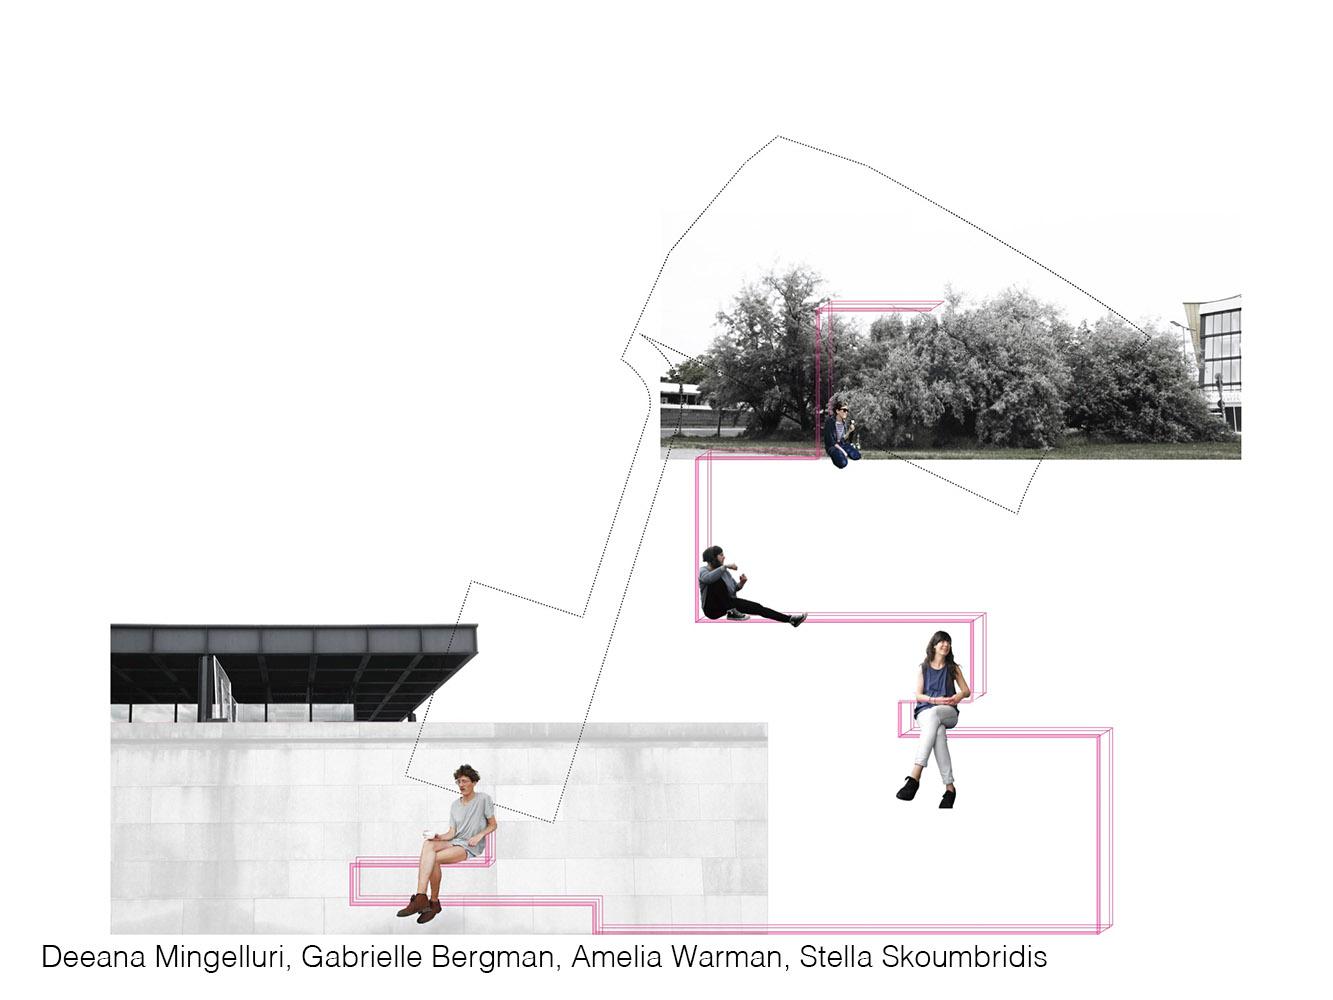 Deeana Mingelluri, Gabrielle Bergman, Amelia Warman, Stella Skoumbridis.jpg